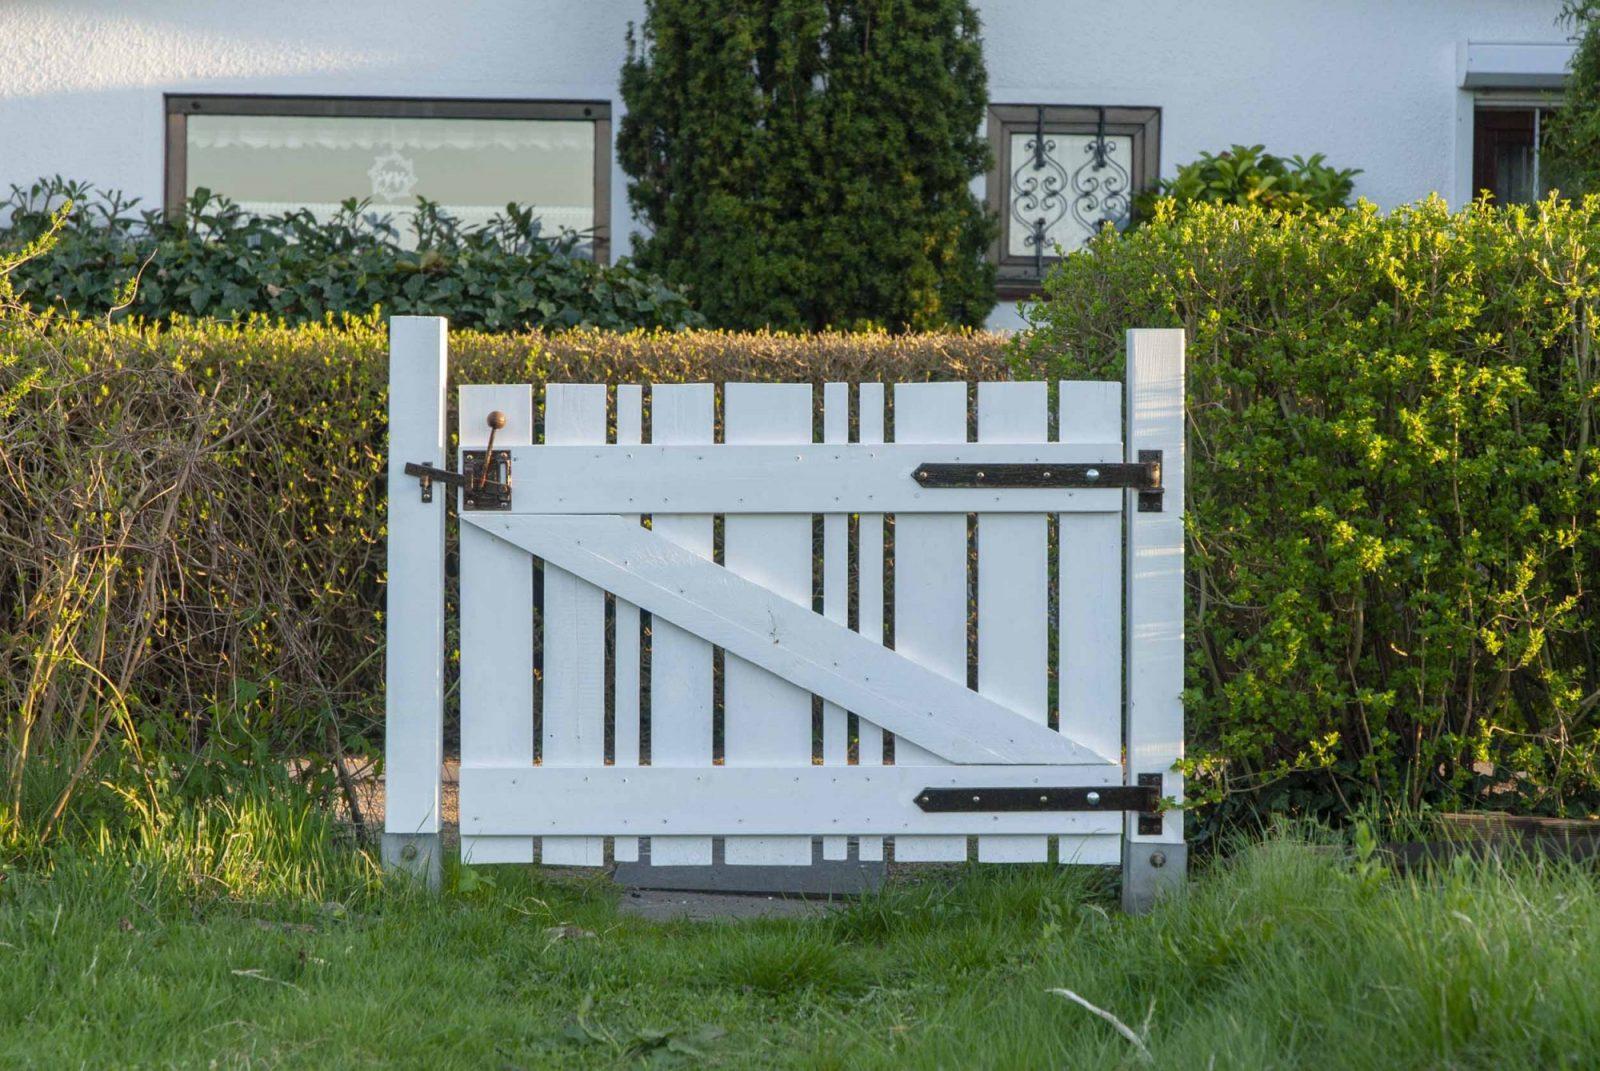 Gartentor Selber Bauen Schritt Für Schritt Erklärt – Mit Vielen von Gartentor Selber Bauen Anleitung Bild